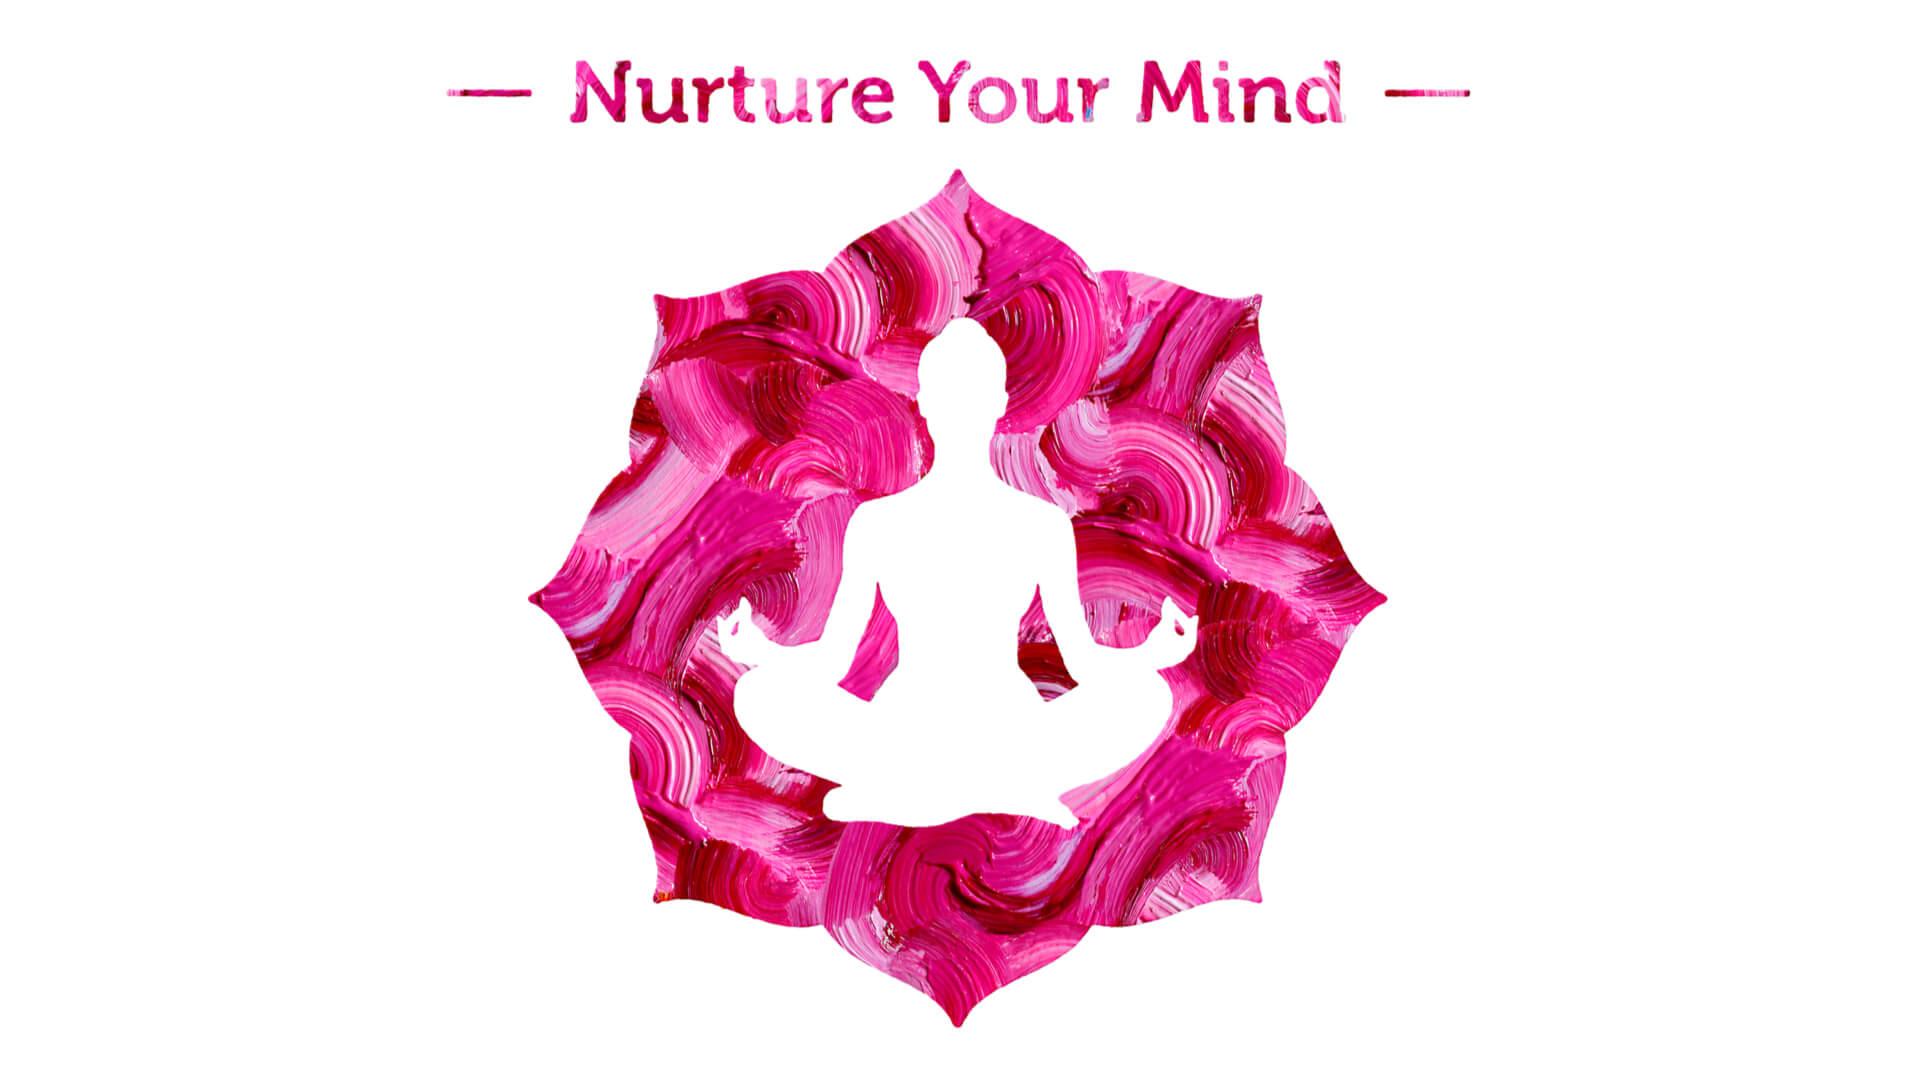 meditate on your creatiivity